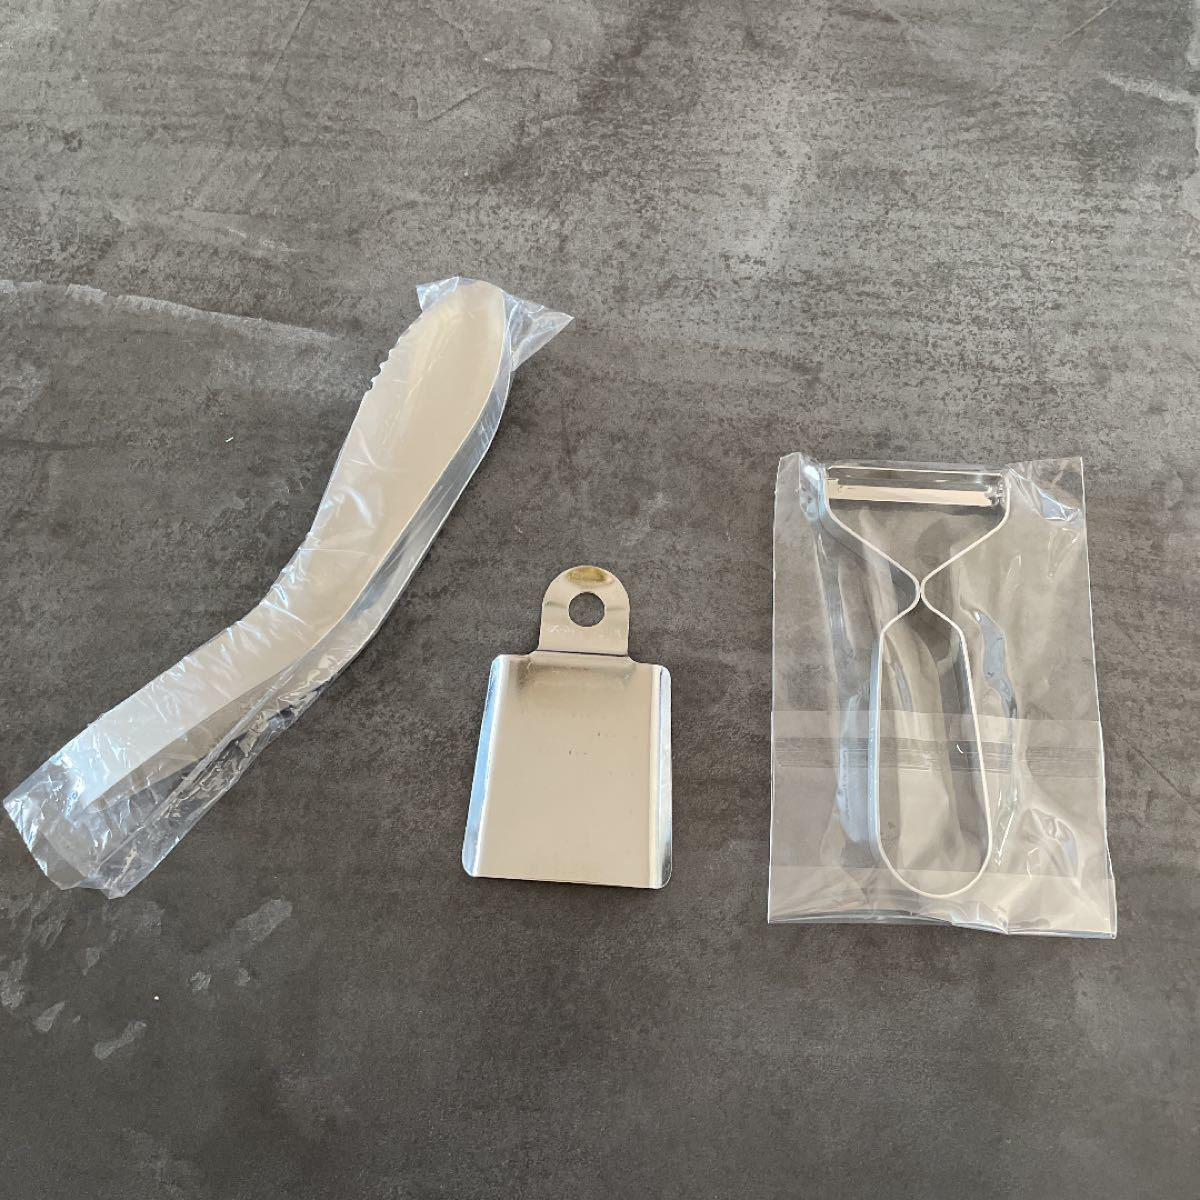 ramncha様専用 ツバメカトラリー 11点セット 新品未使用 made in tsubame 燕